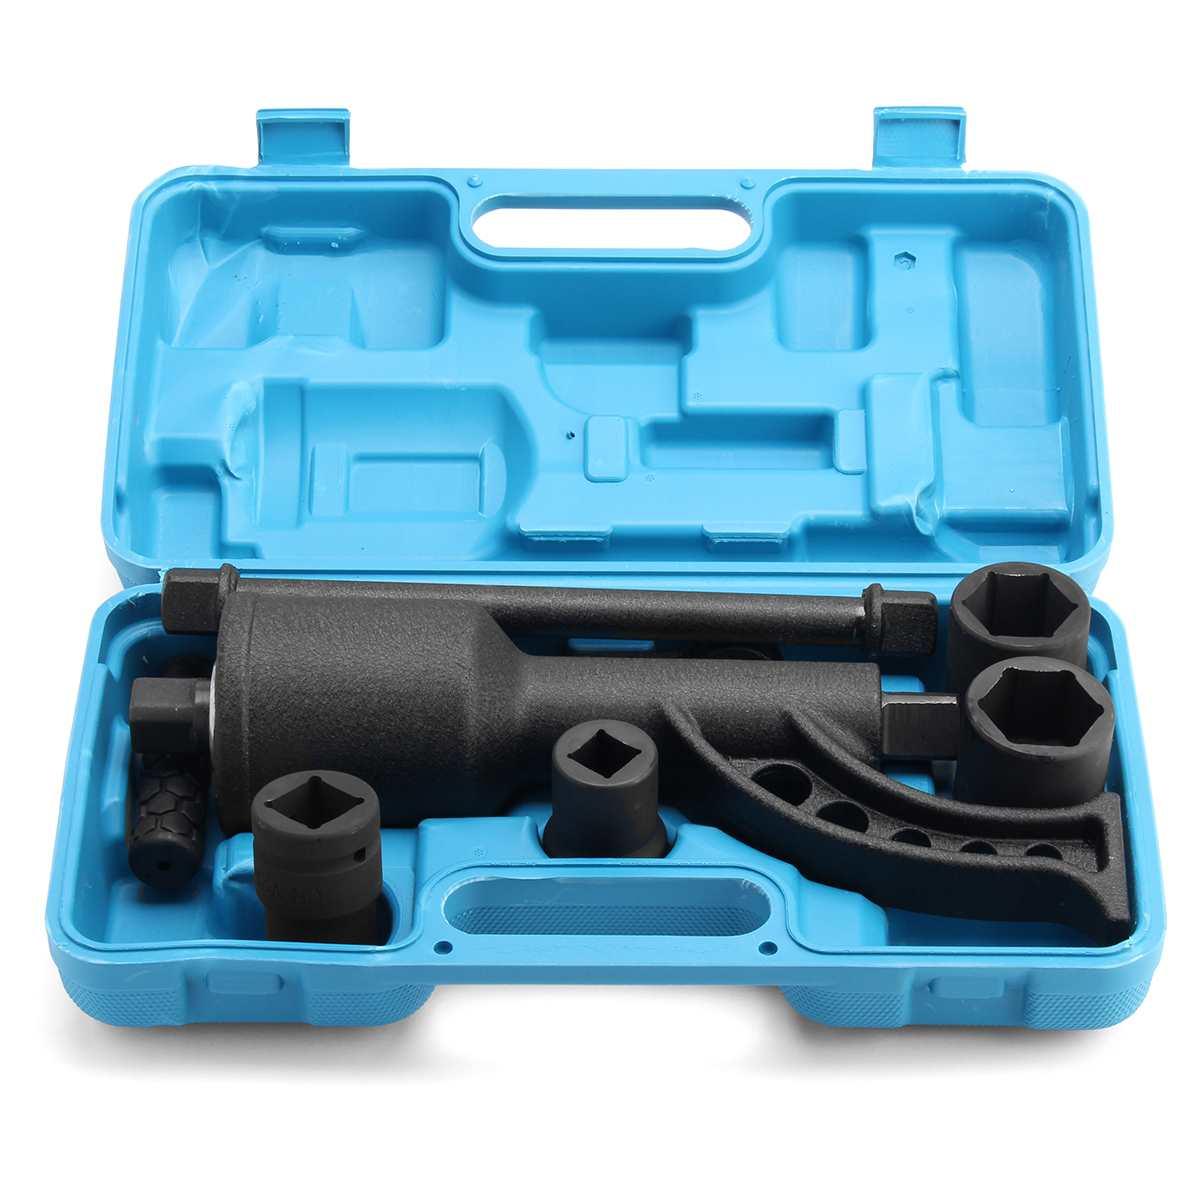 Torque Multiplier Wrench Lug Nut Lugnuts Remover Labor Saving Socket Car Wash Maintenance Engine Care